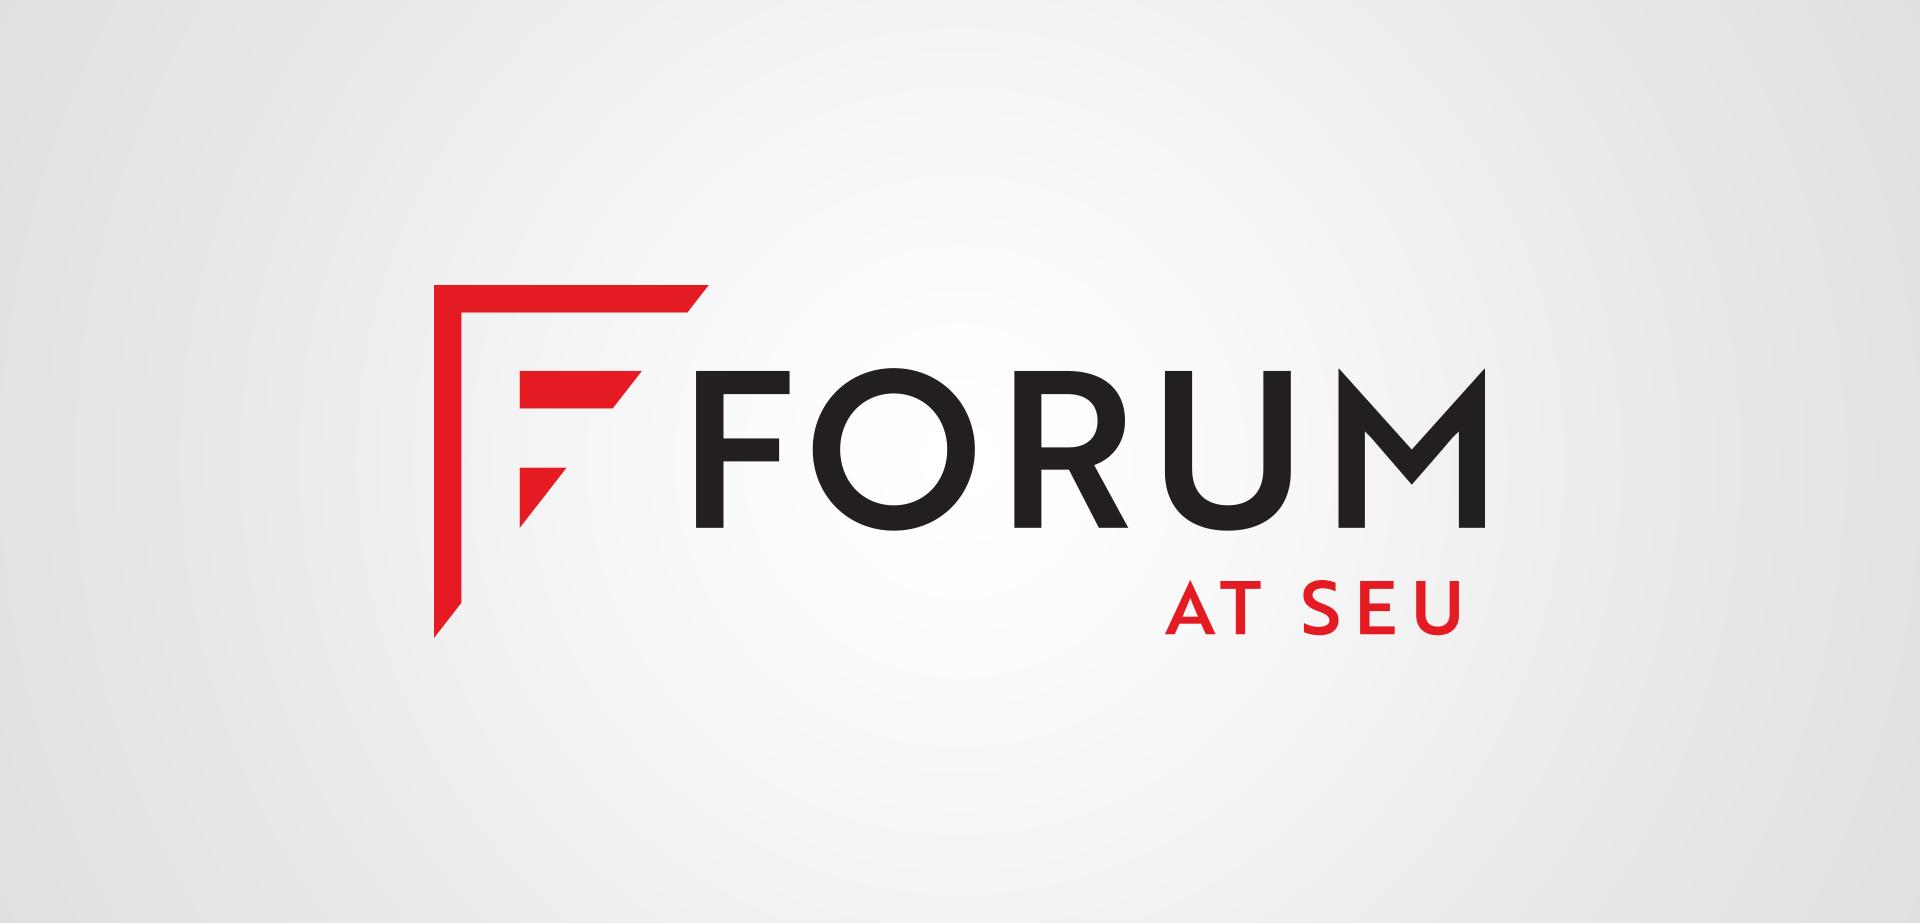 Southeastern University Forum at SEU Logo Design Silver Addy Award for MADE